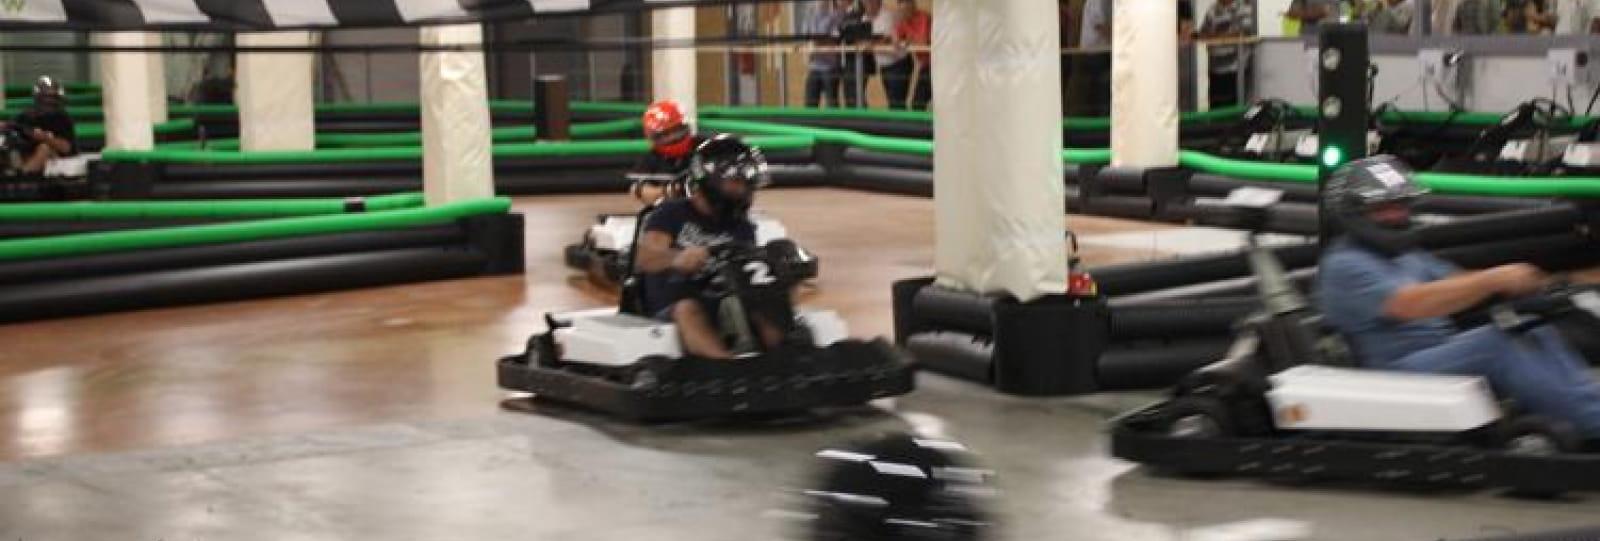 Saint Paul Kart Team